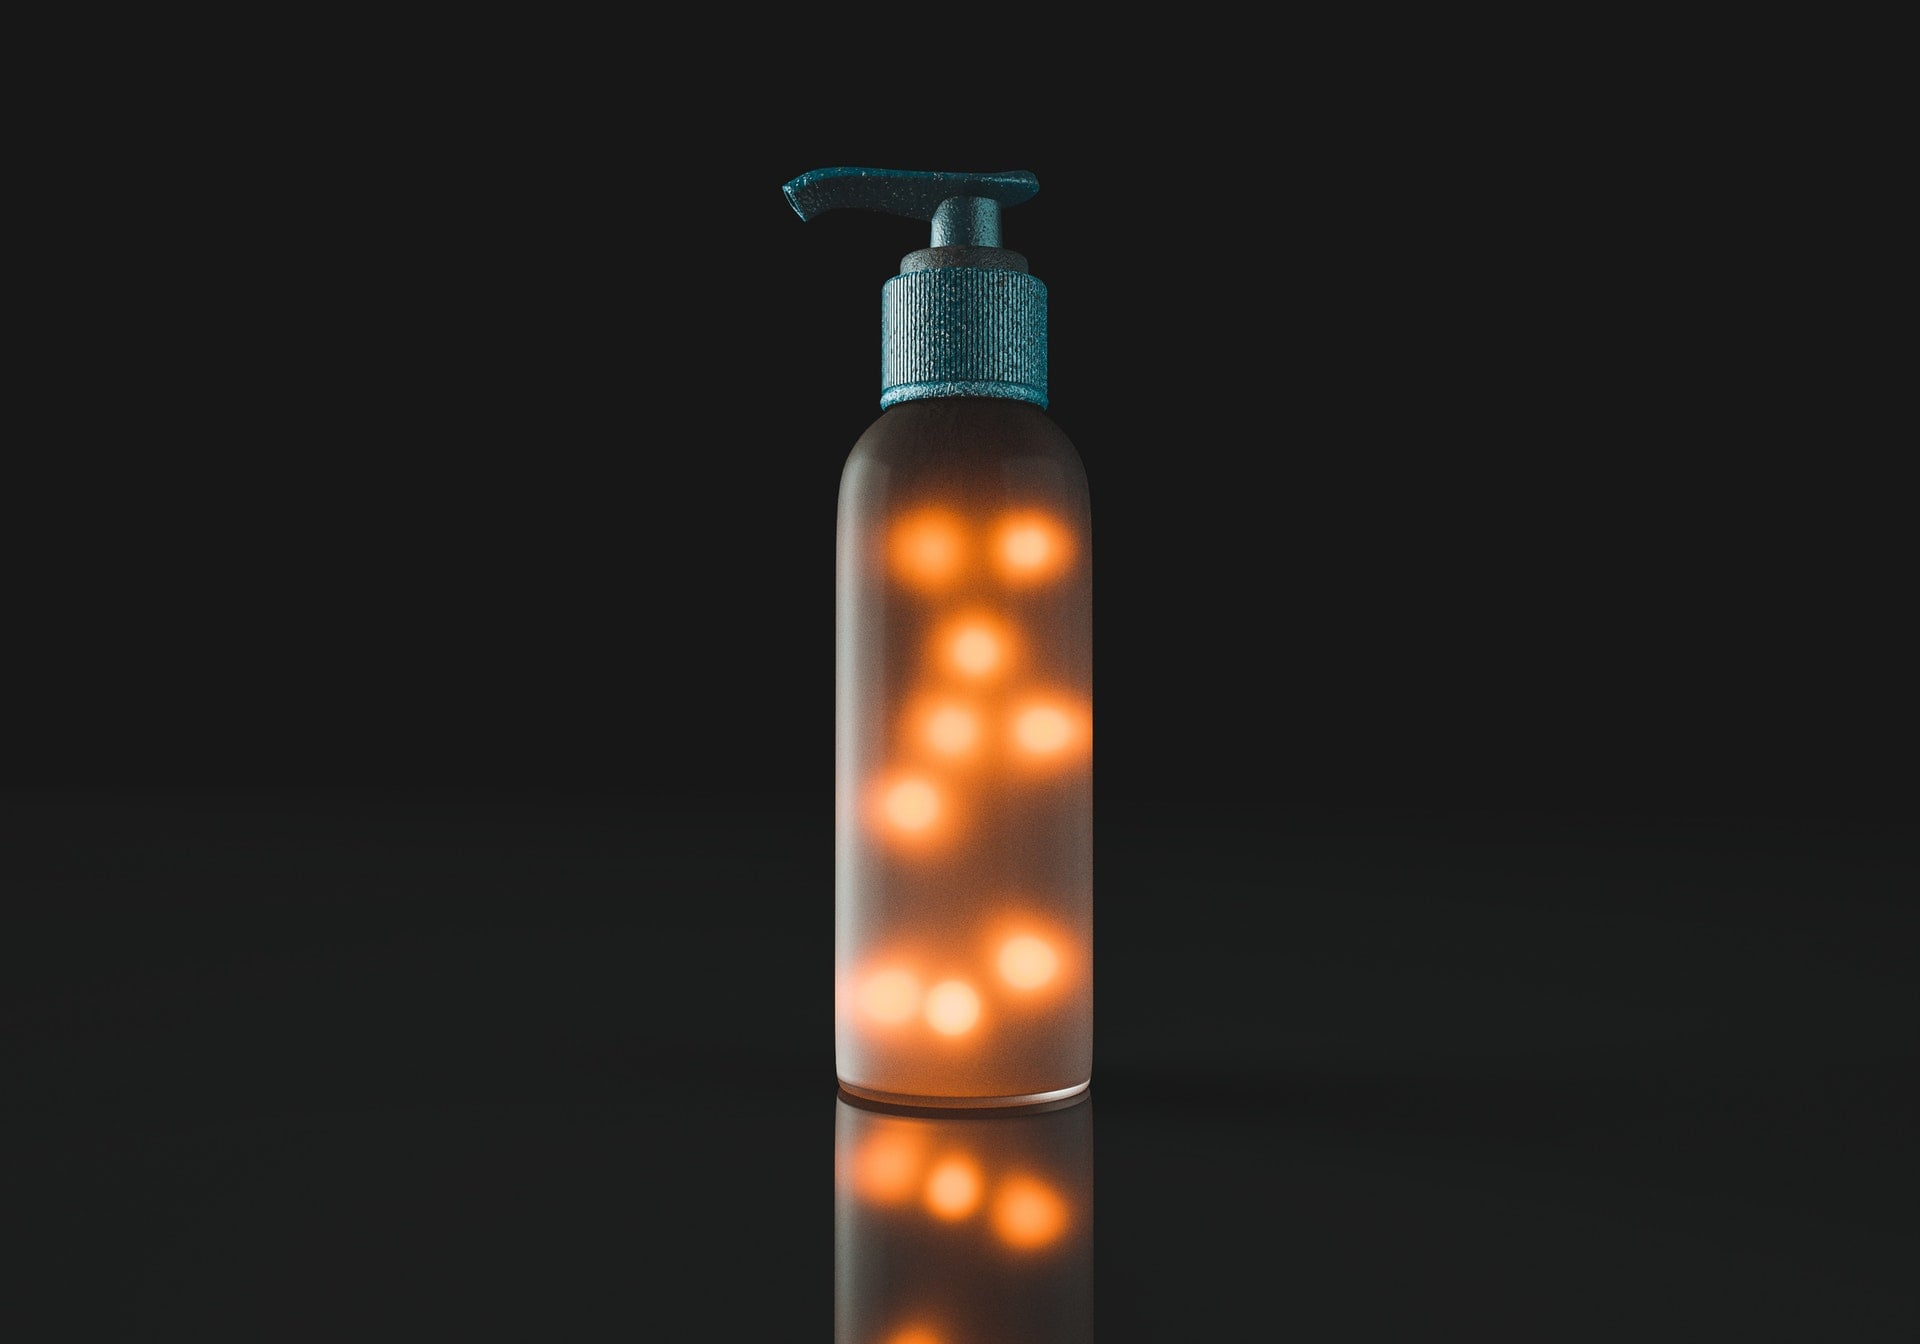 soap shampoo pump bottle led light 還在用家庭號洗髮精?對頭髮健康看來是壞主意